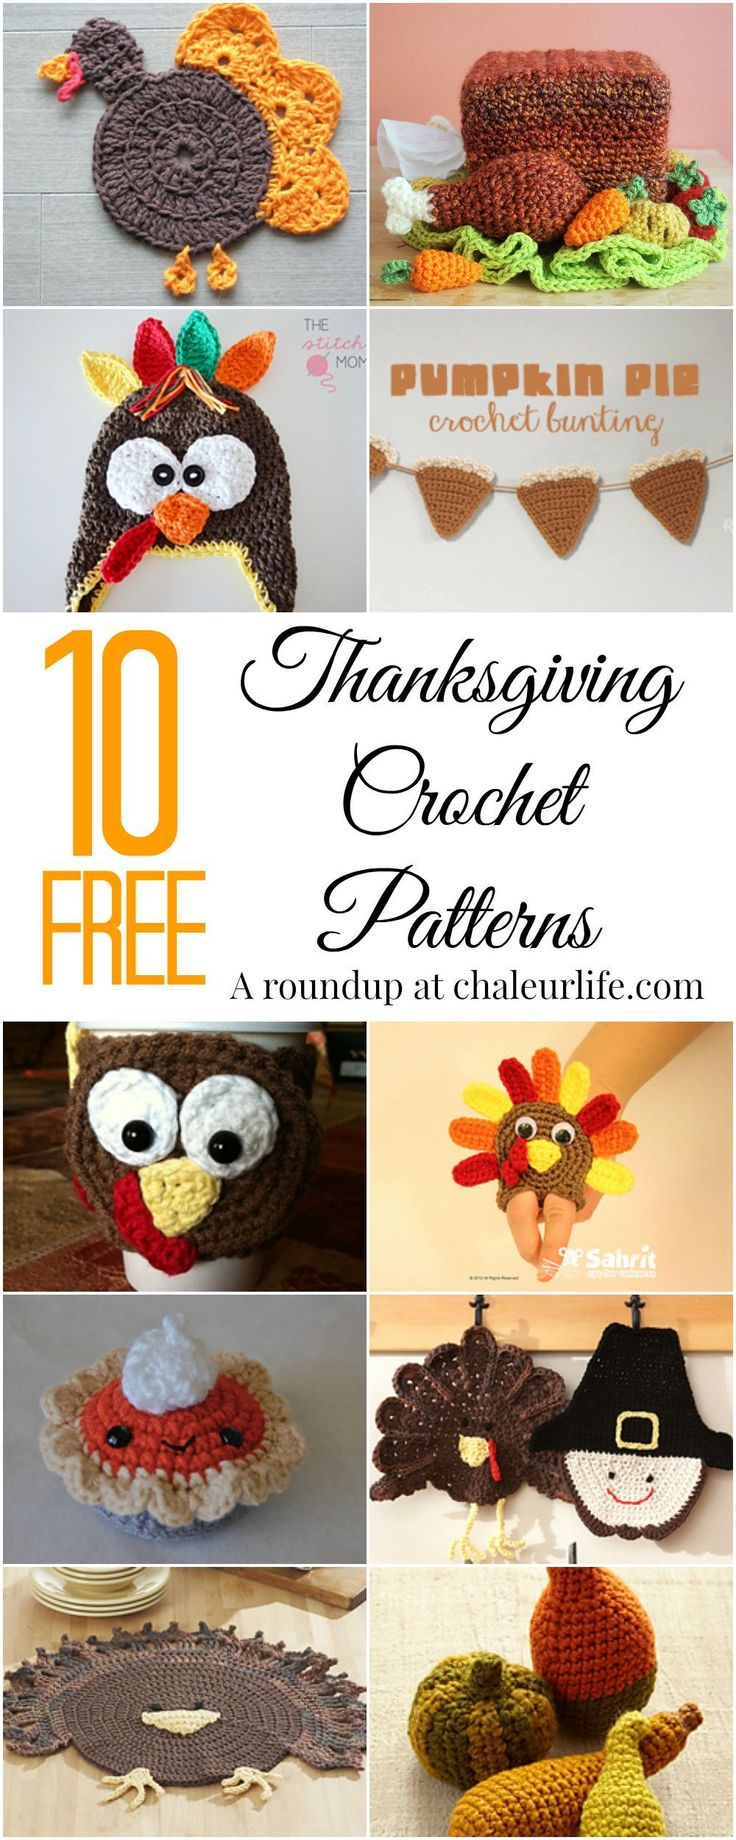 10 Free Thanksgiving Crochet Patterns in 2020 Urlaub